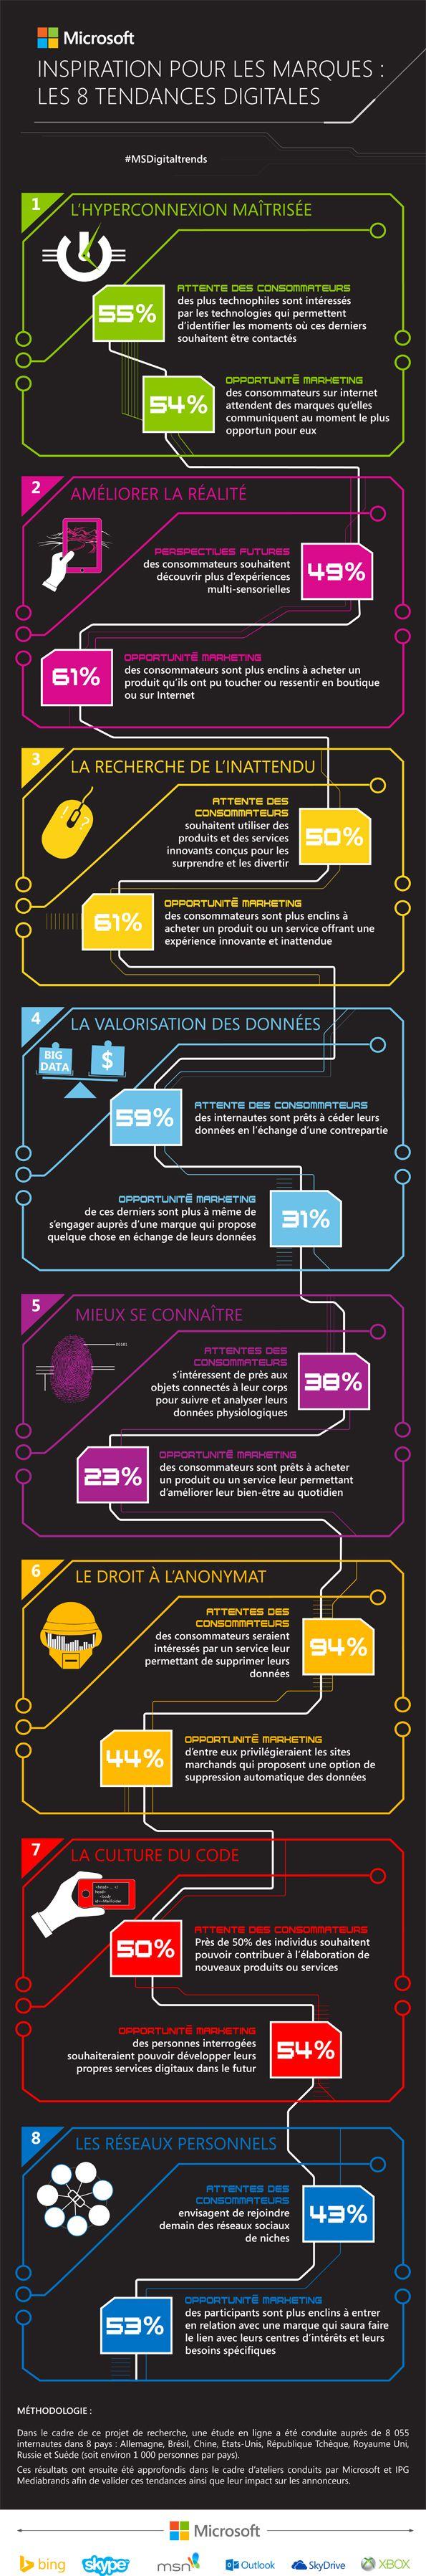 8 digital trends selon Microsoft #tendances #trend #digital #infogra^phir #marketing